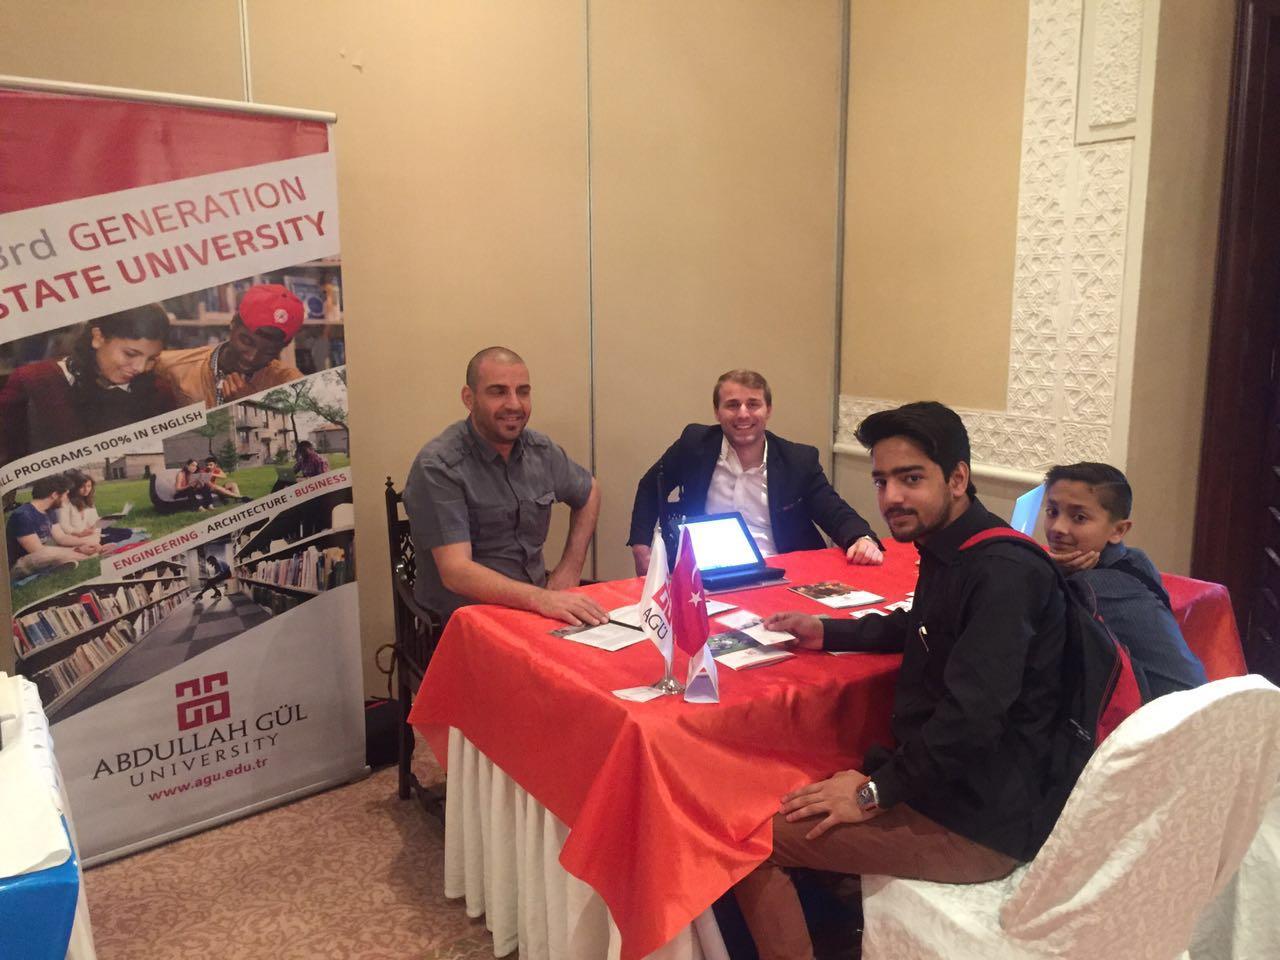 Abdullah Gül University, AGU, Third Generation, State University, International Office, Student Recruitment, Pakistan, fair, Internationalization, Engineering, Architecture, Business, 100% English